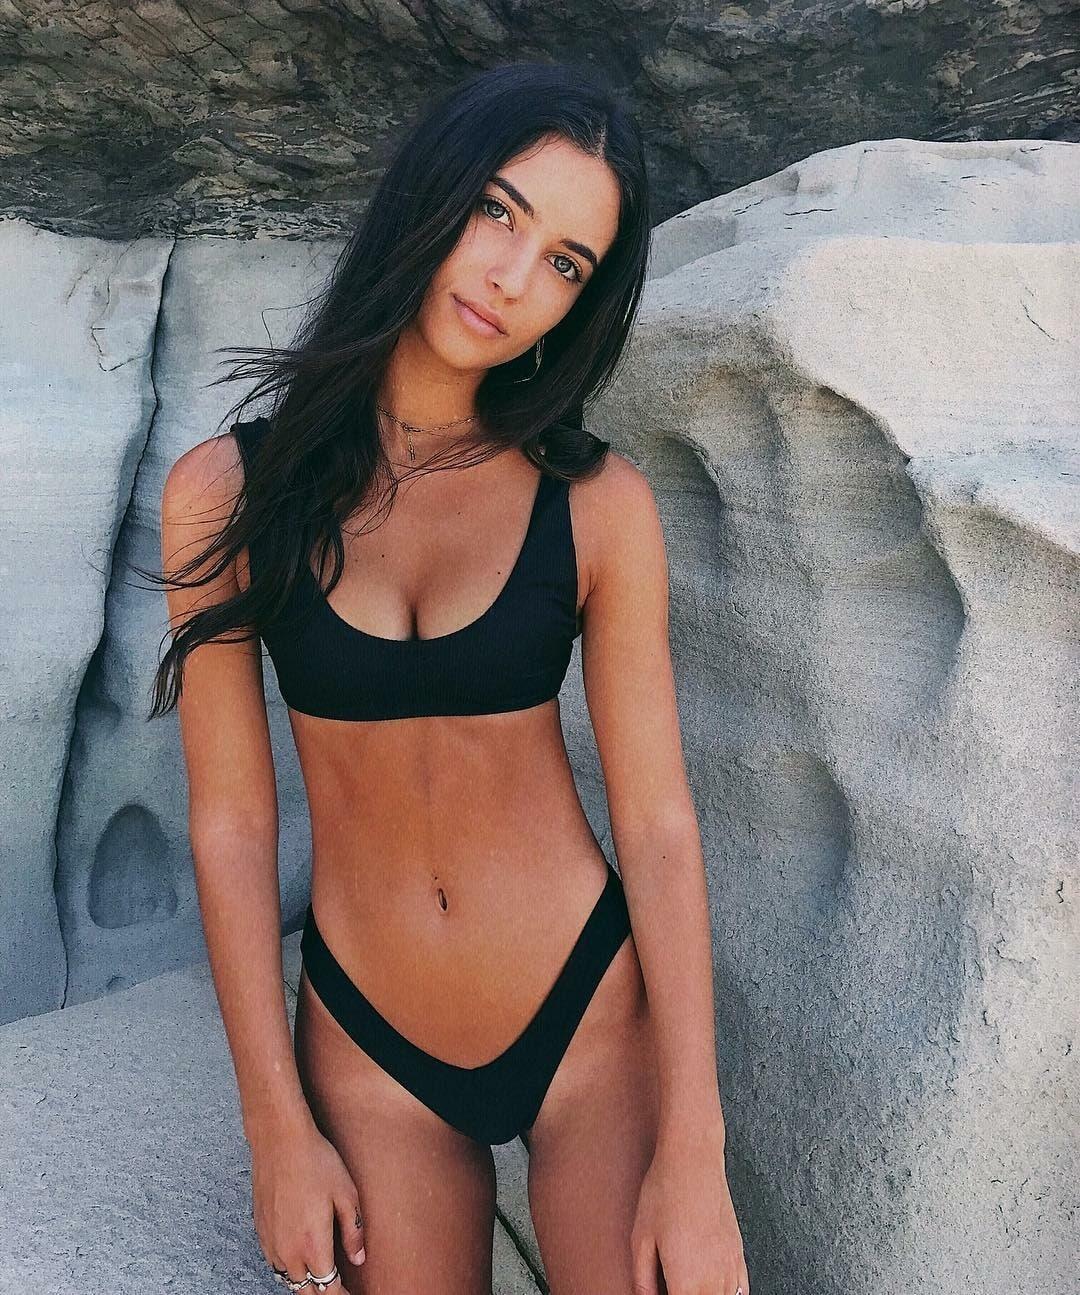 Fotos Elisha Herbert nude (25 photos), Sexy, Sideboobs, Selfie, panties 2020